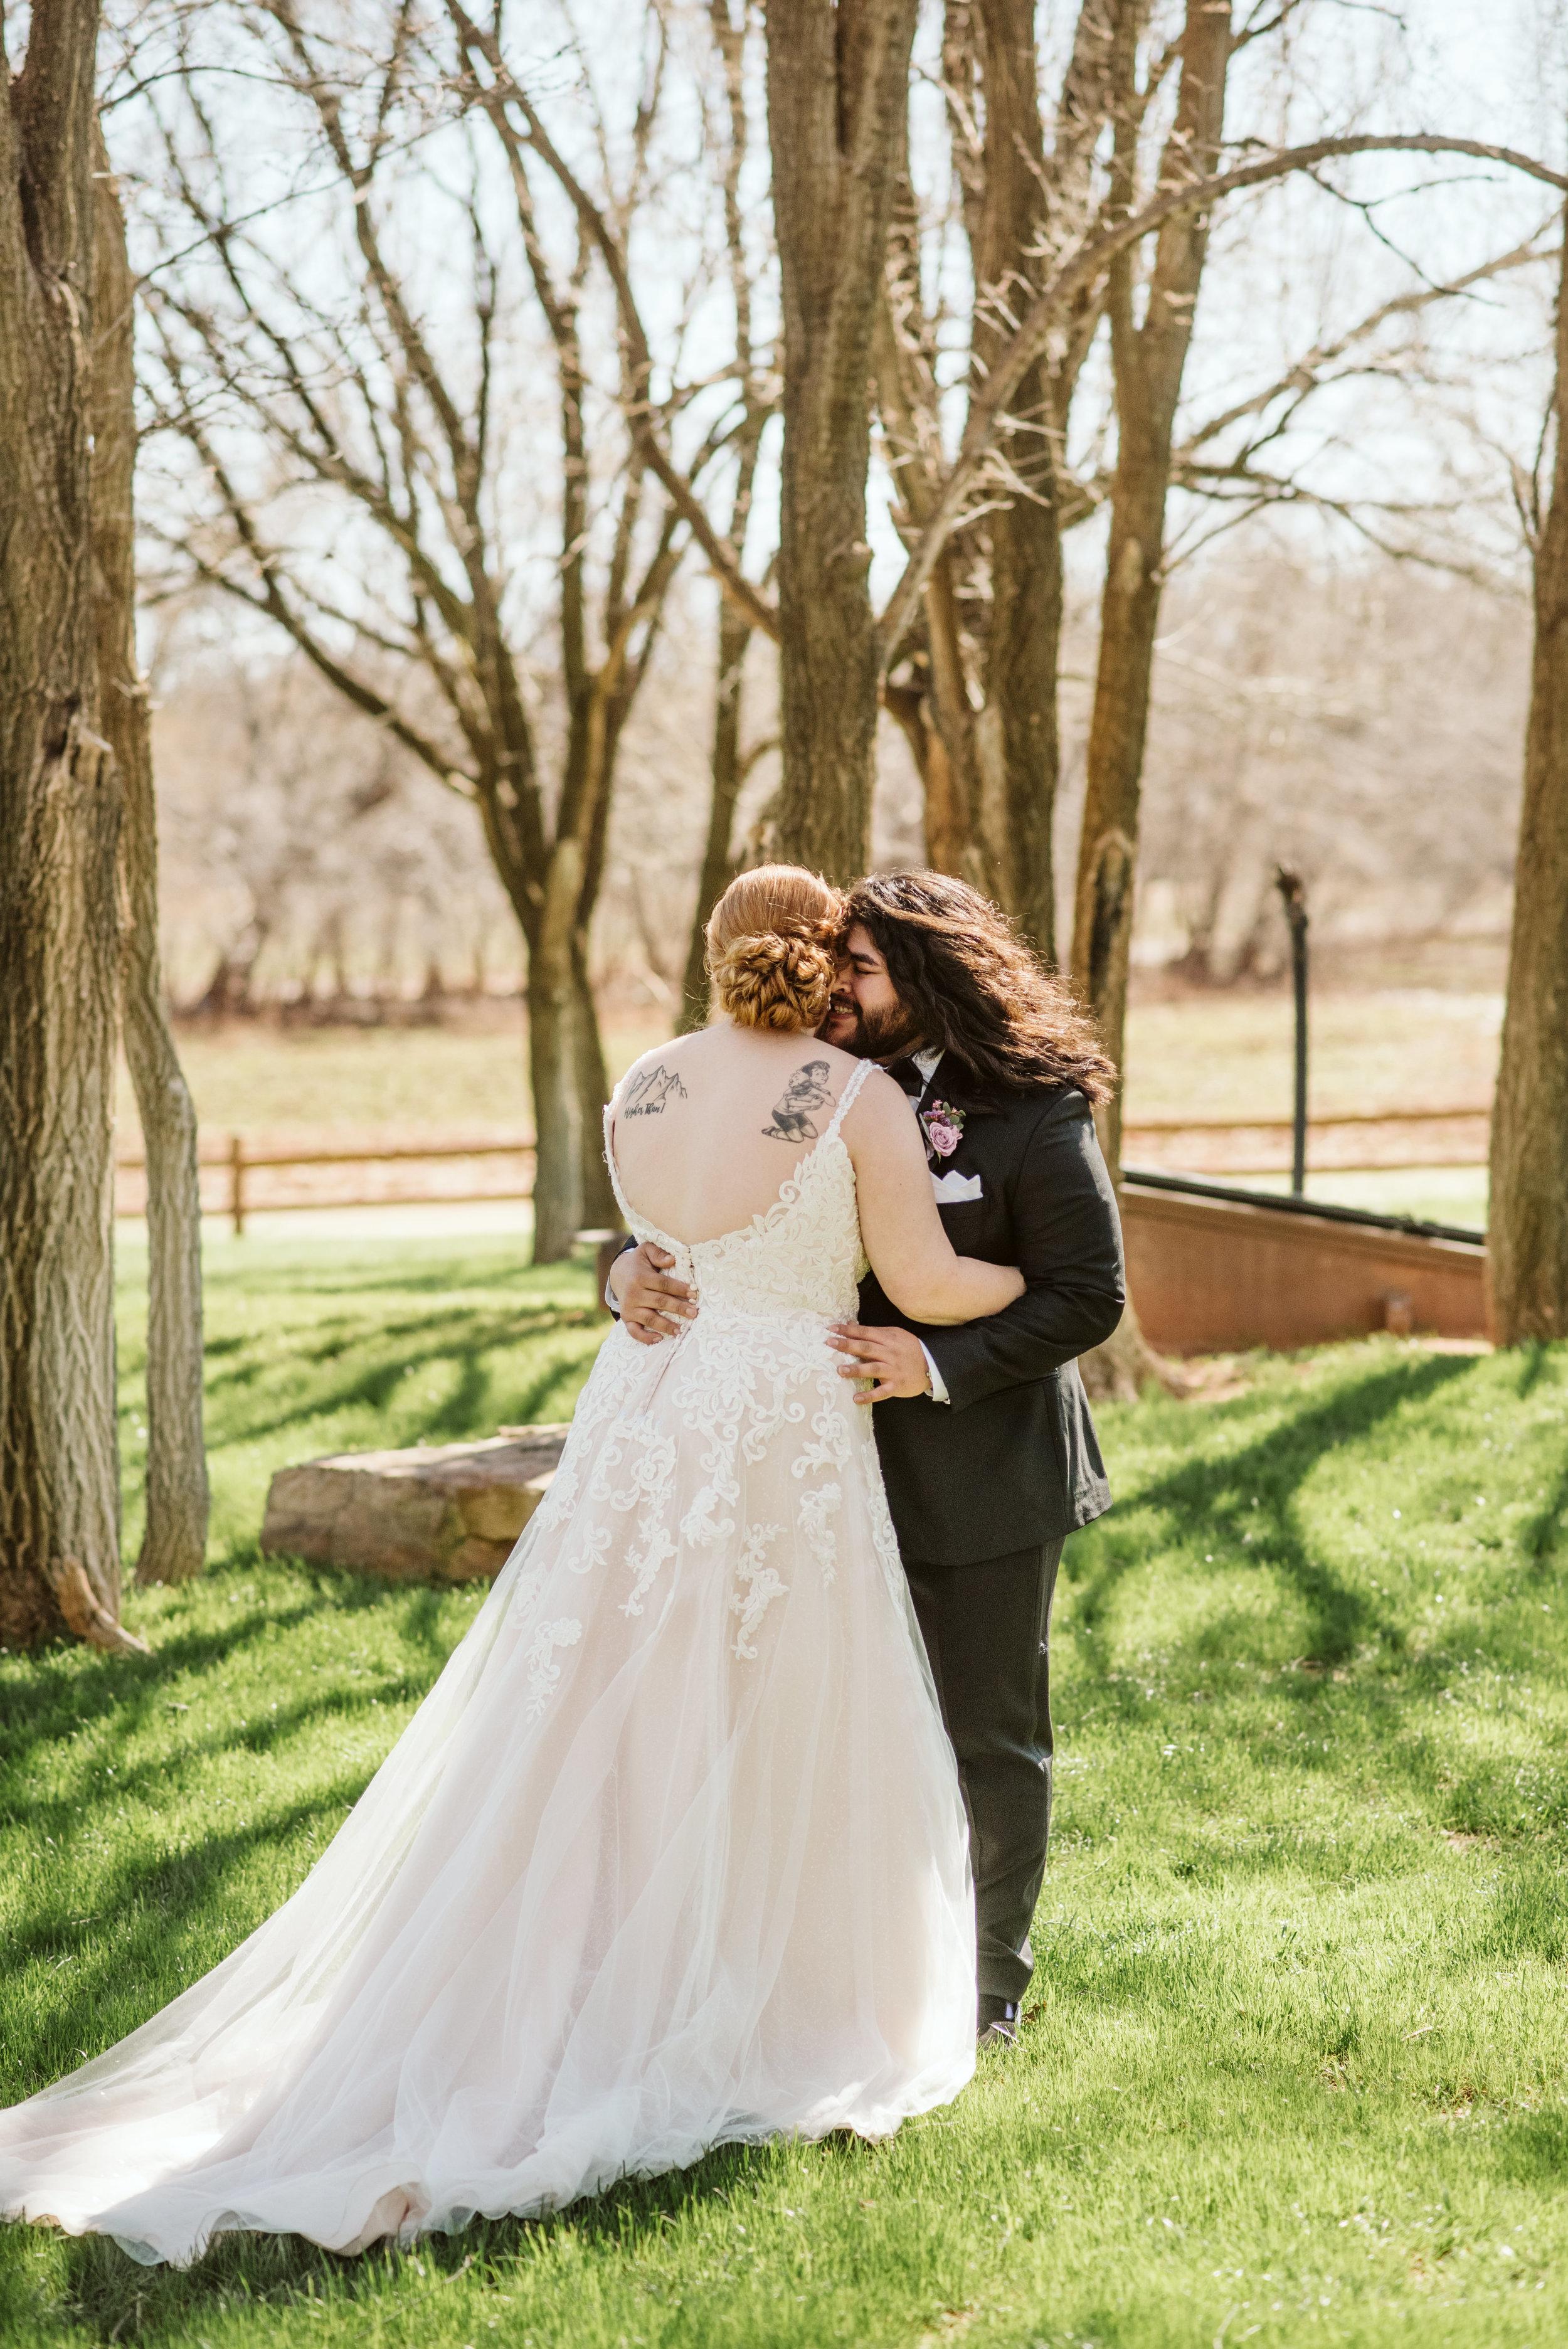 Springs-wedding-photographer-196.jpg